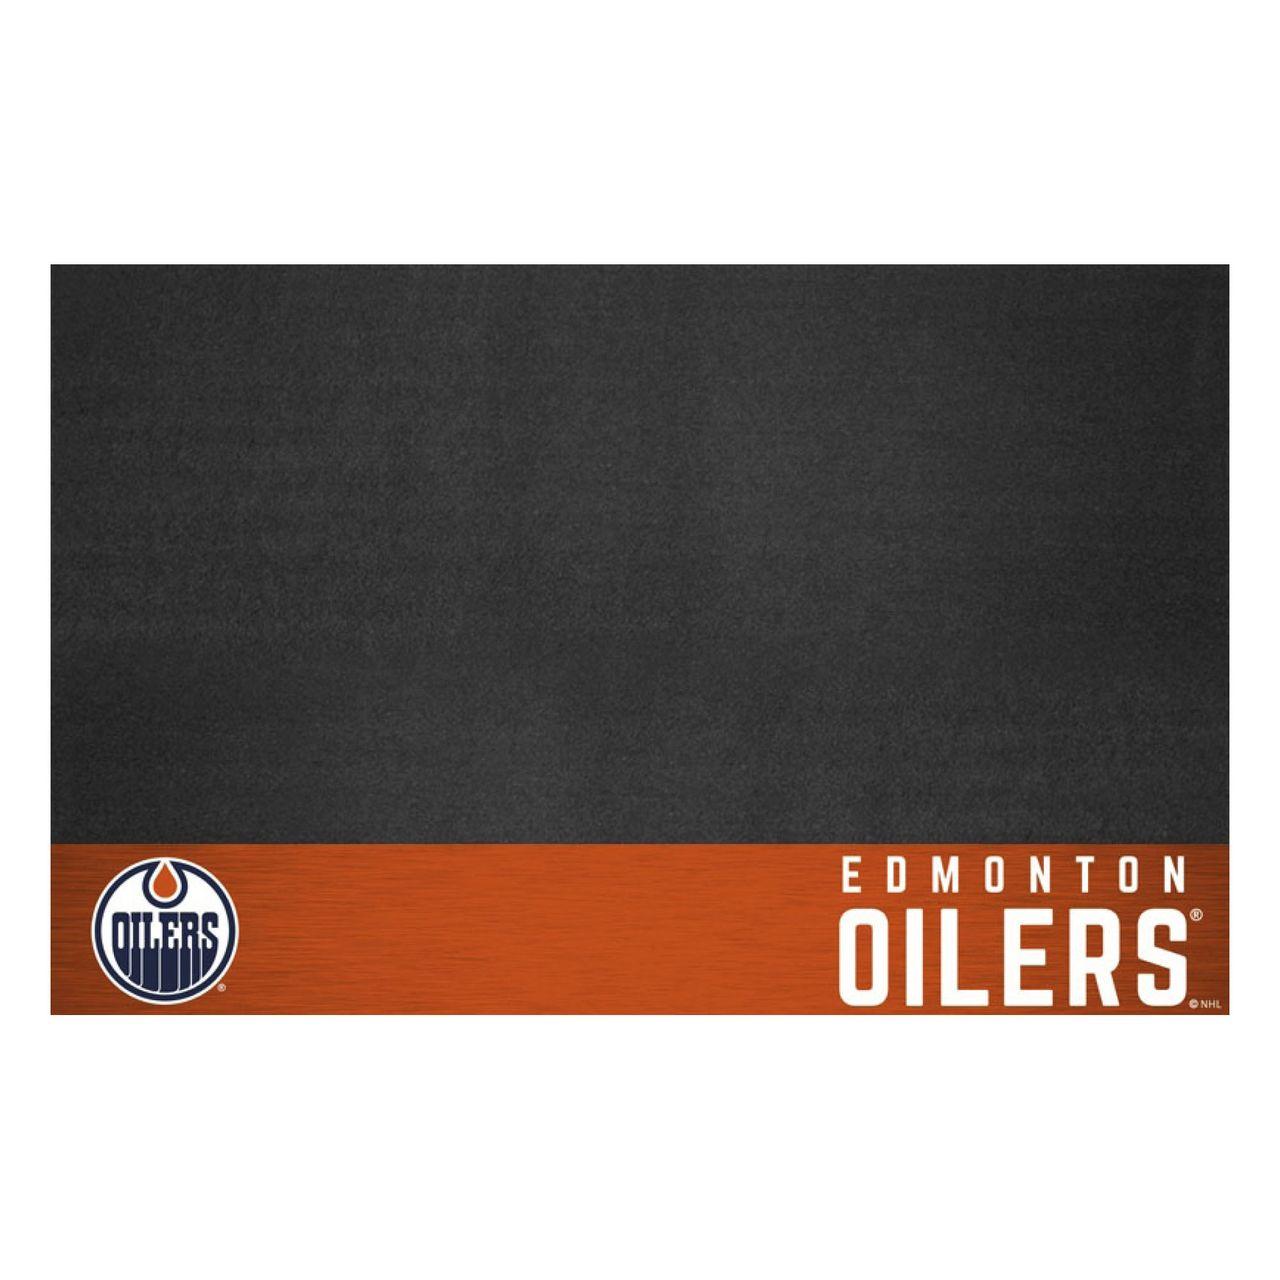 "Fanmats 14235 NHL - Edmonton Oilers Grill Mat 26""x42"""